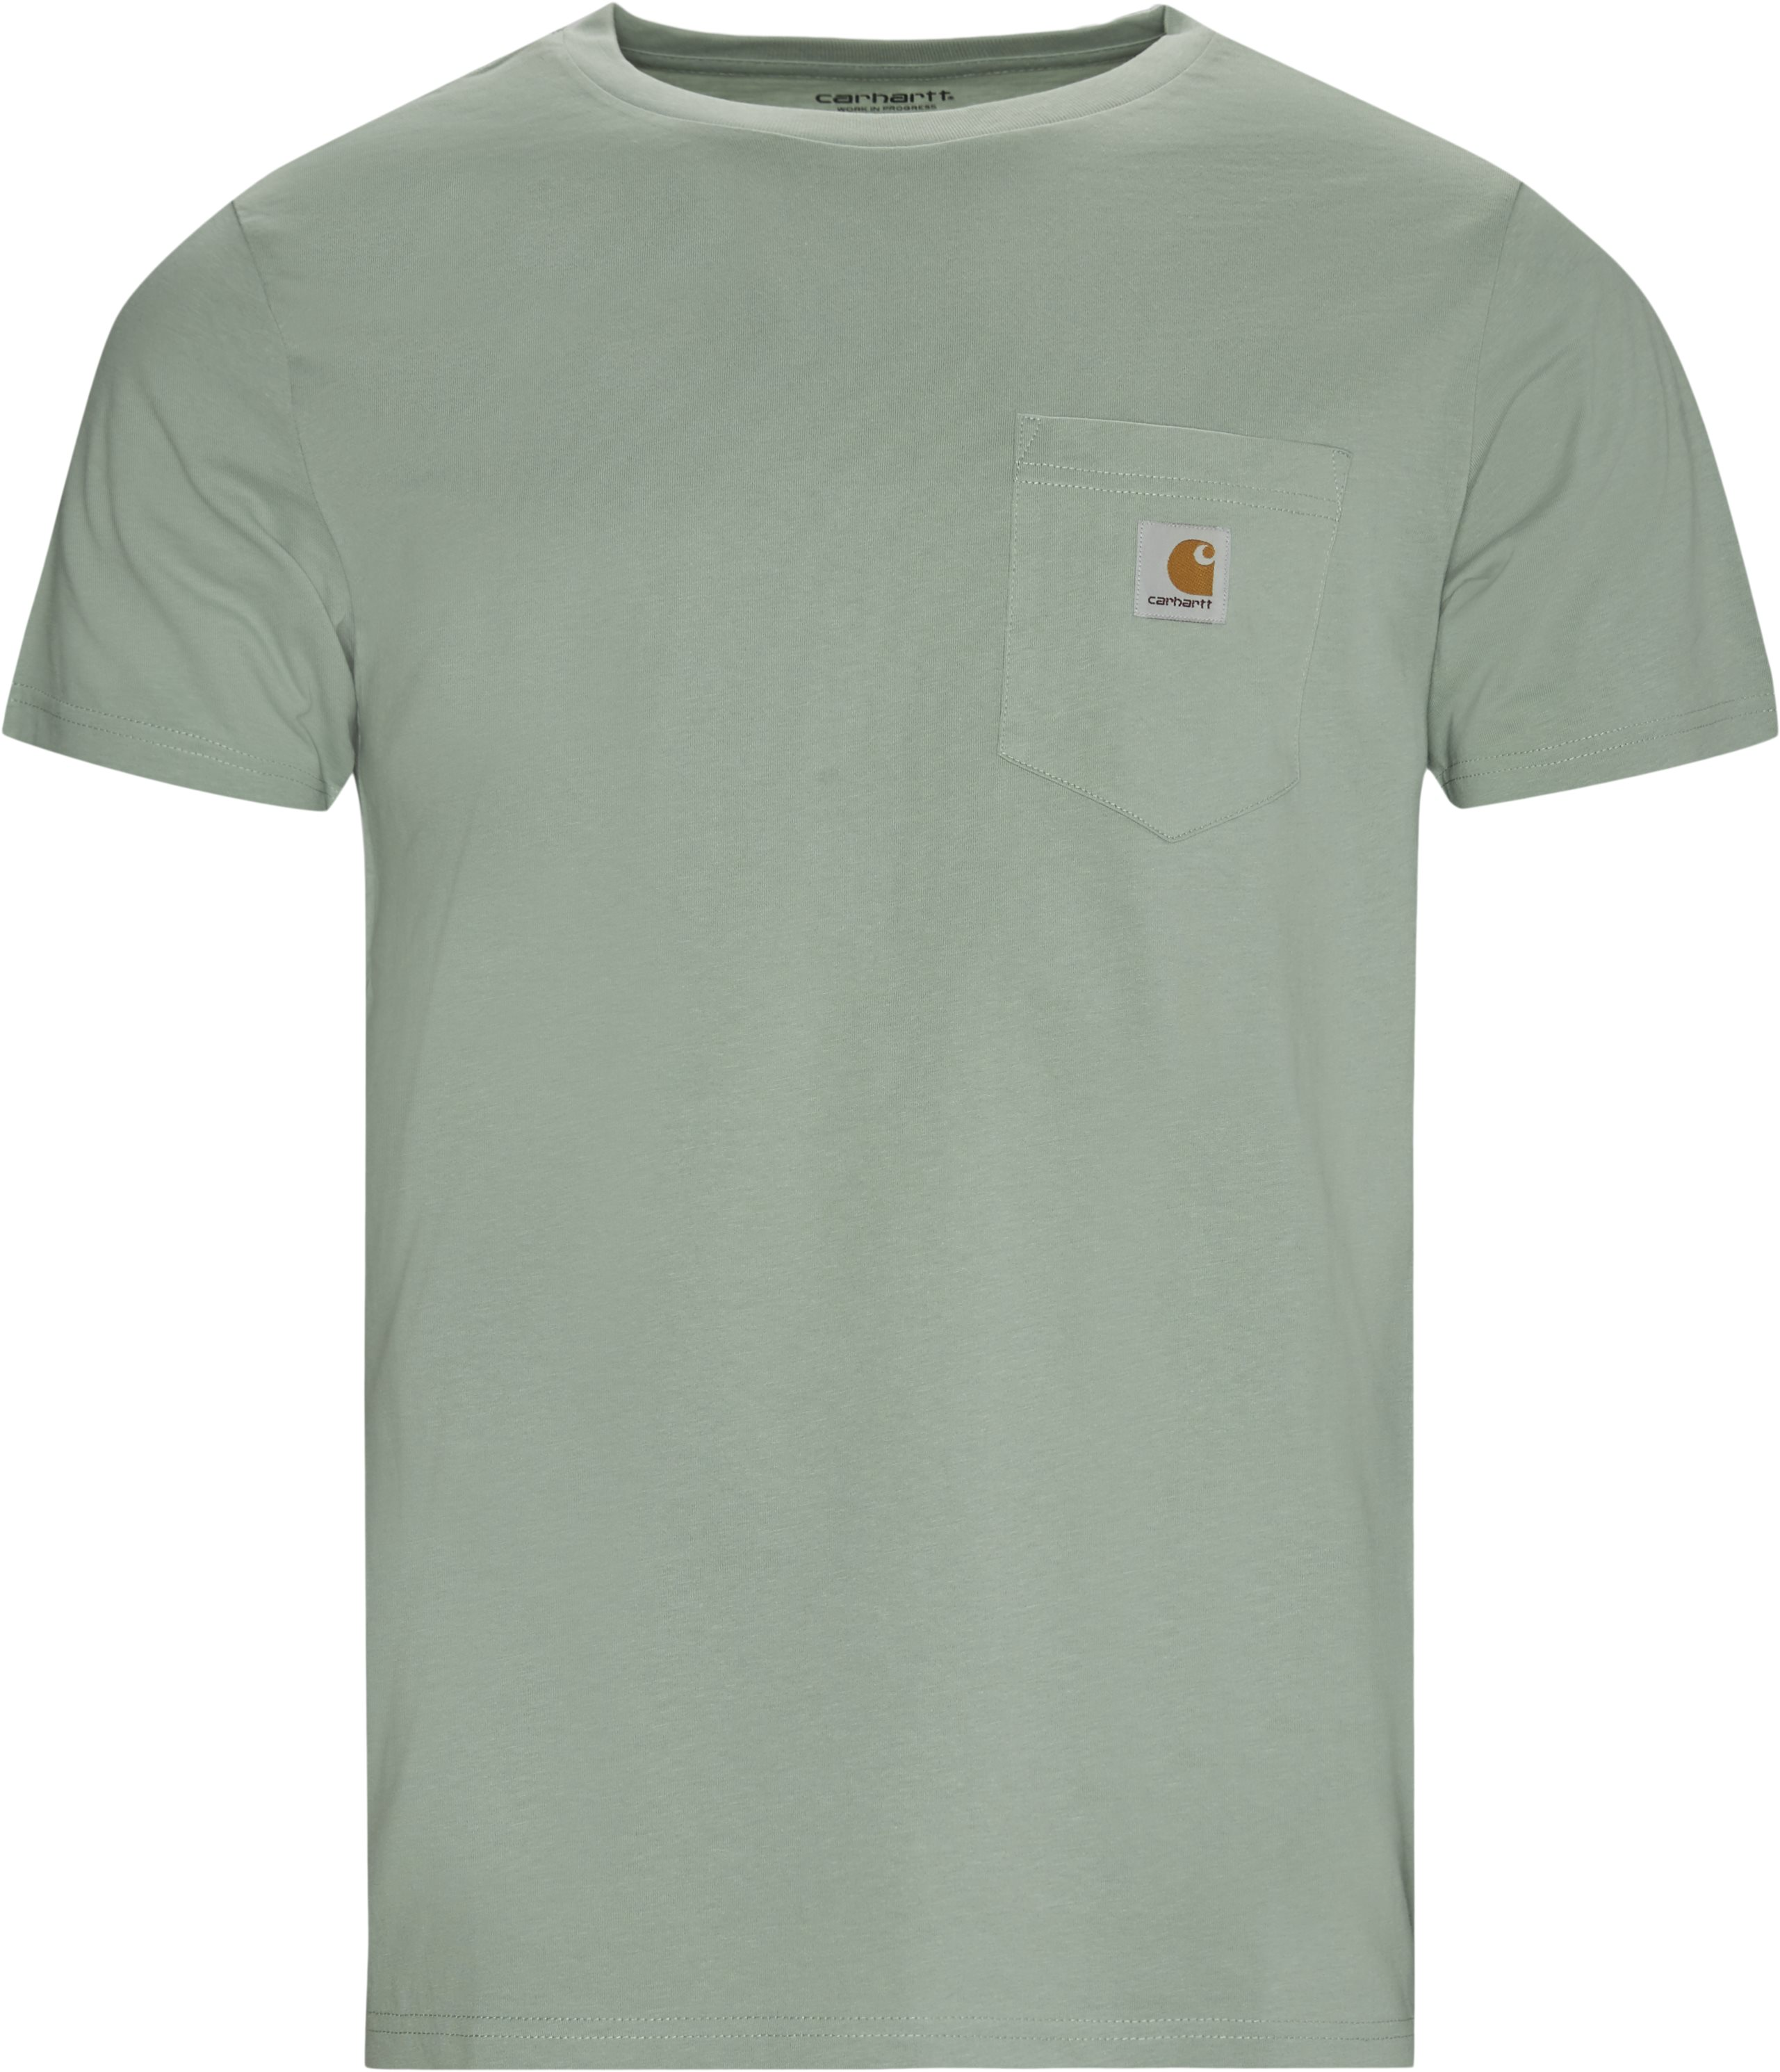 Pocket Tee - T-shirts - Regular fit - Grøn